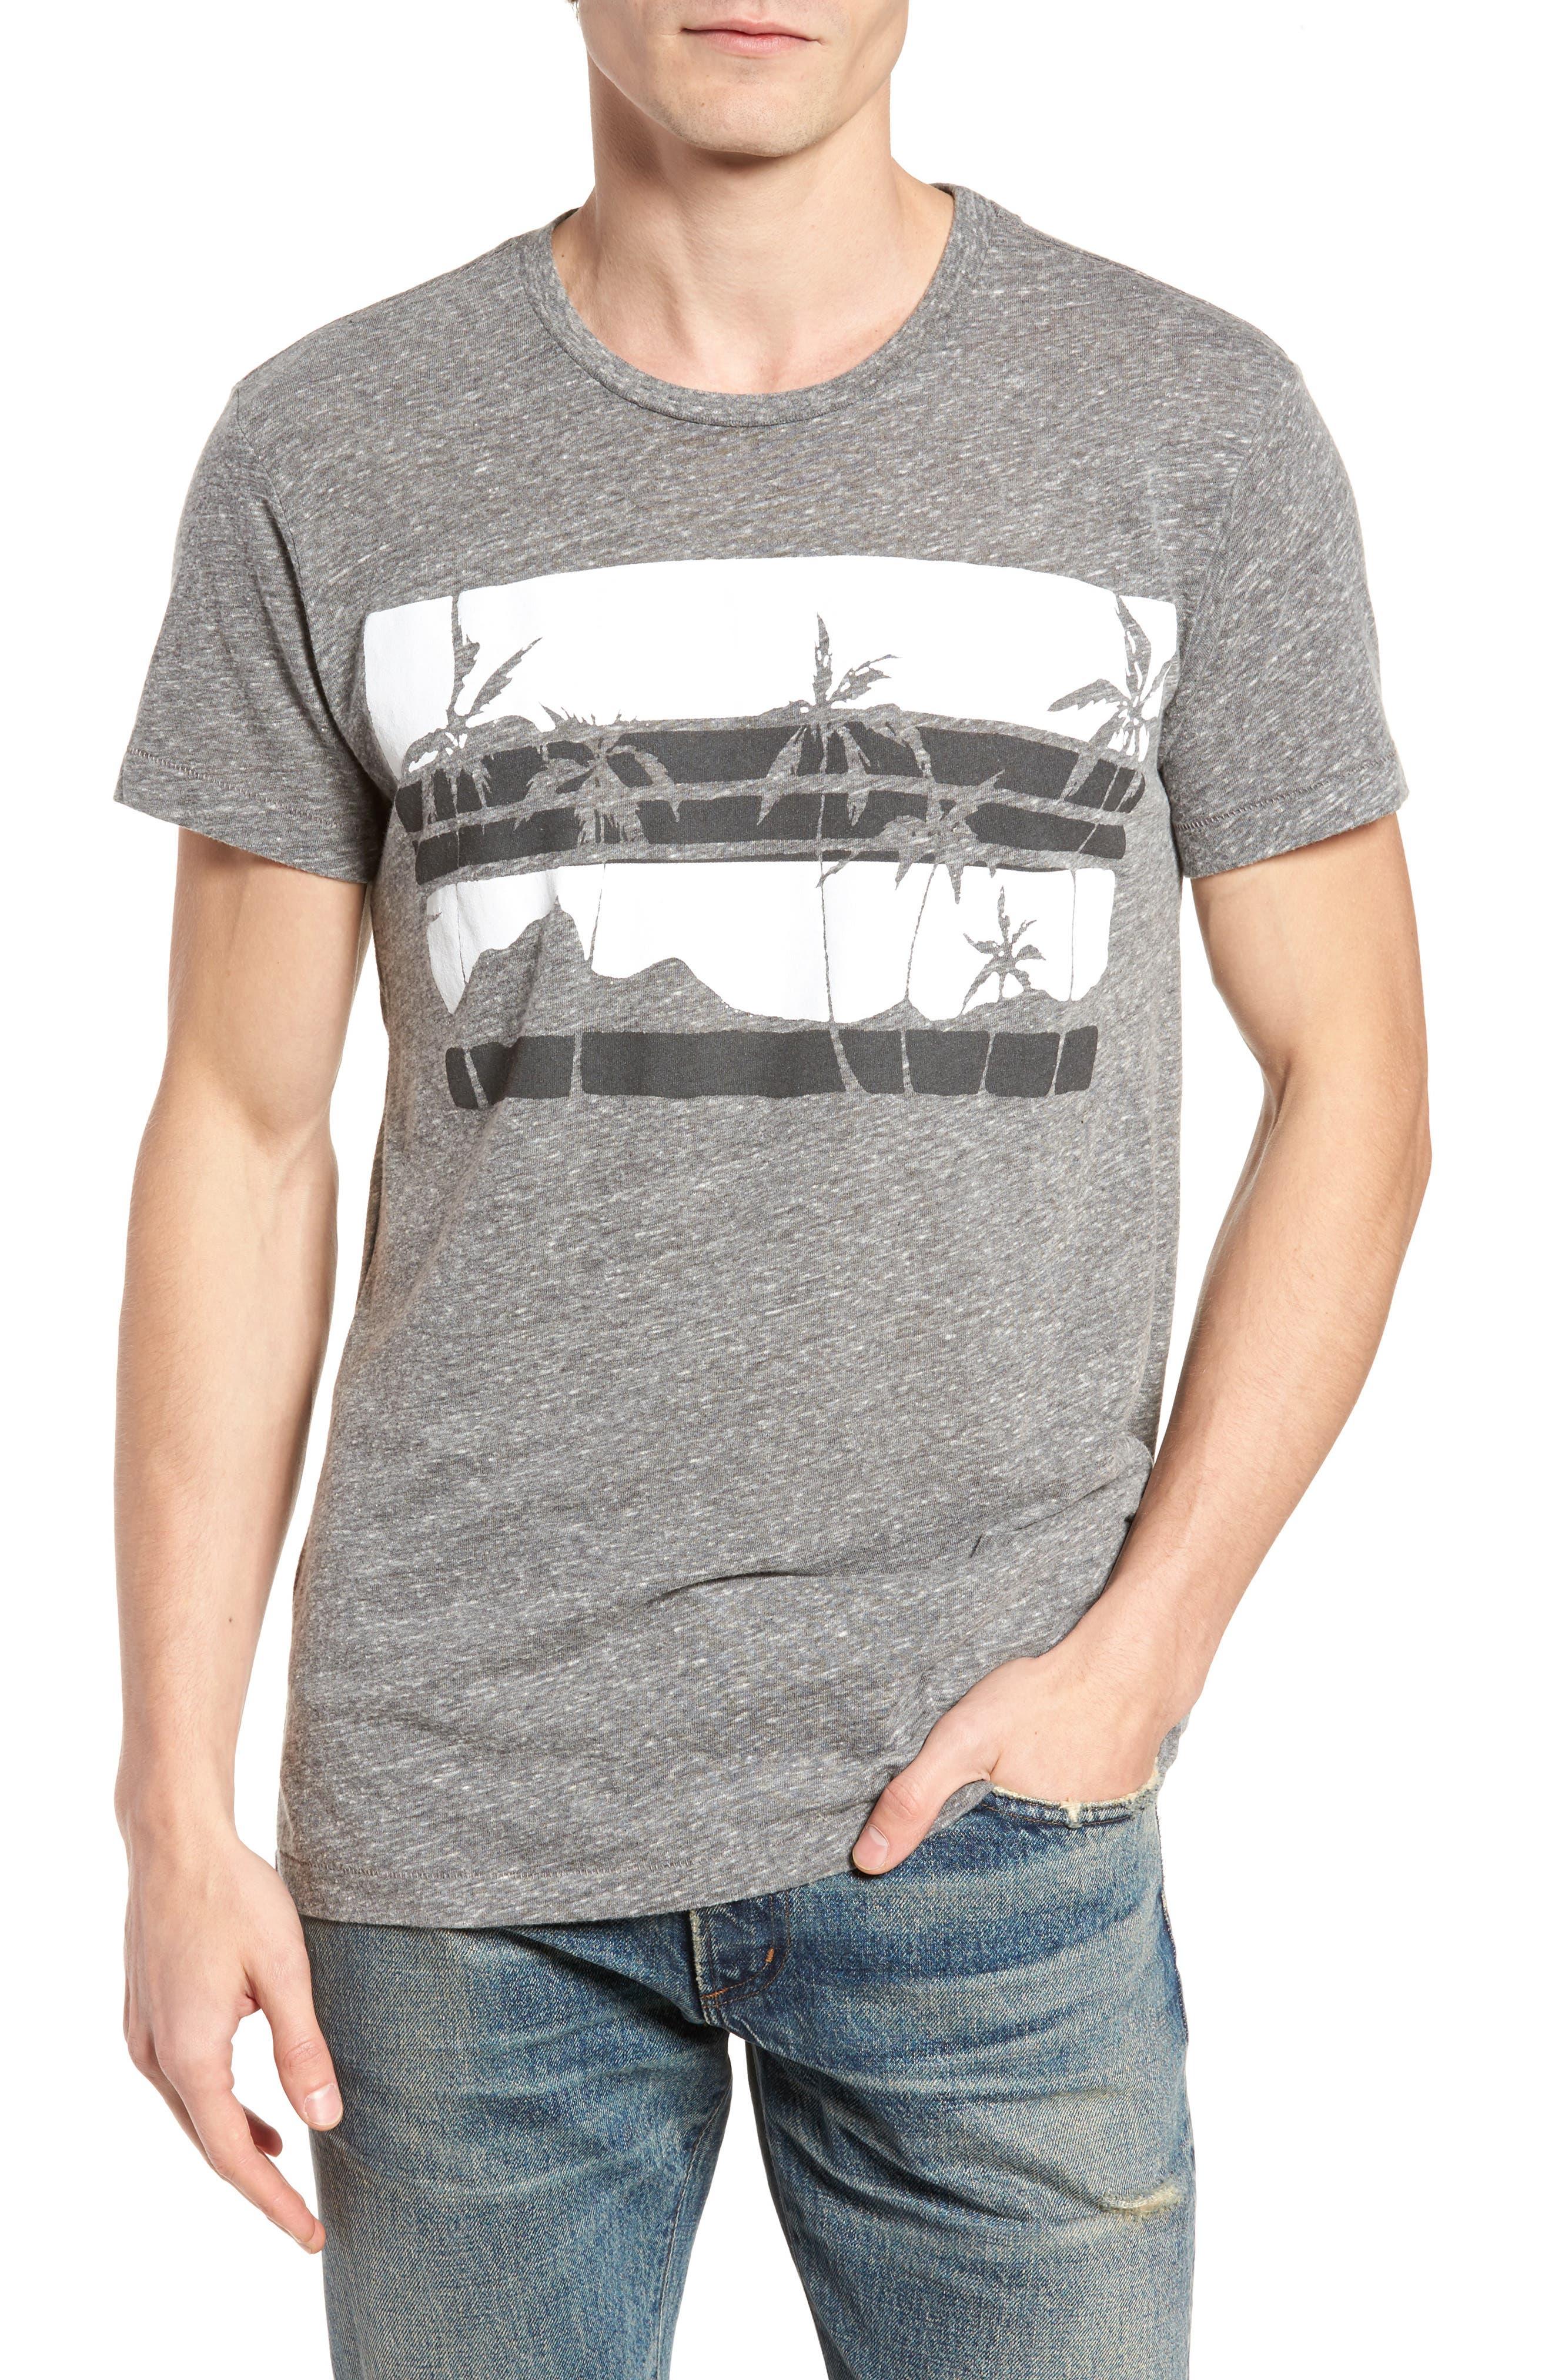 Las Palmas T-Shirt,                             Main thumbnail 1, color,                             Heather Grey